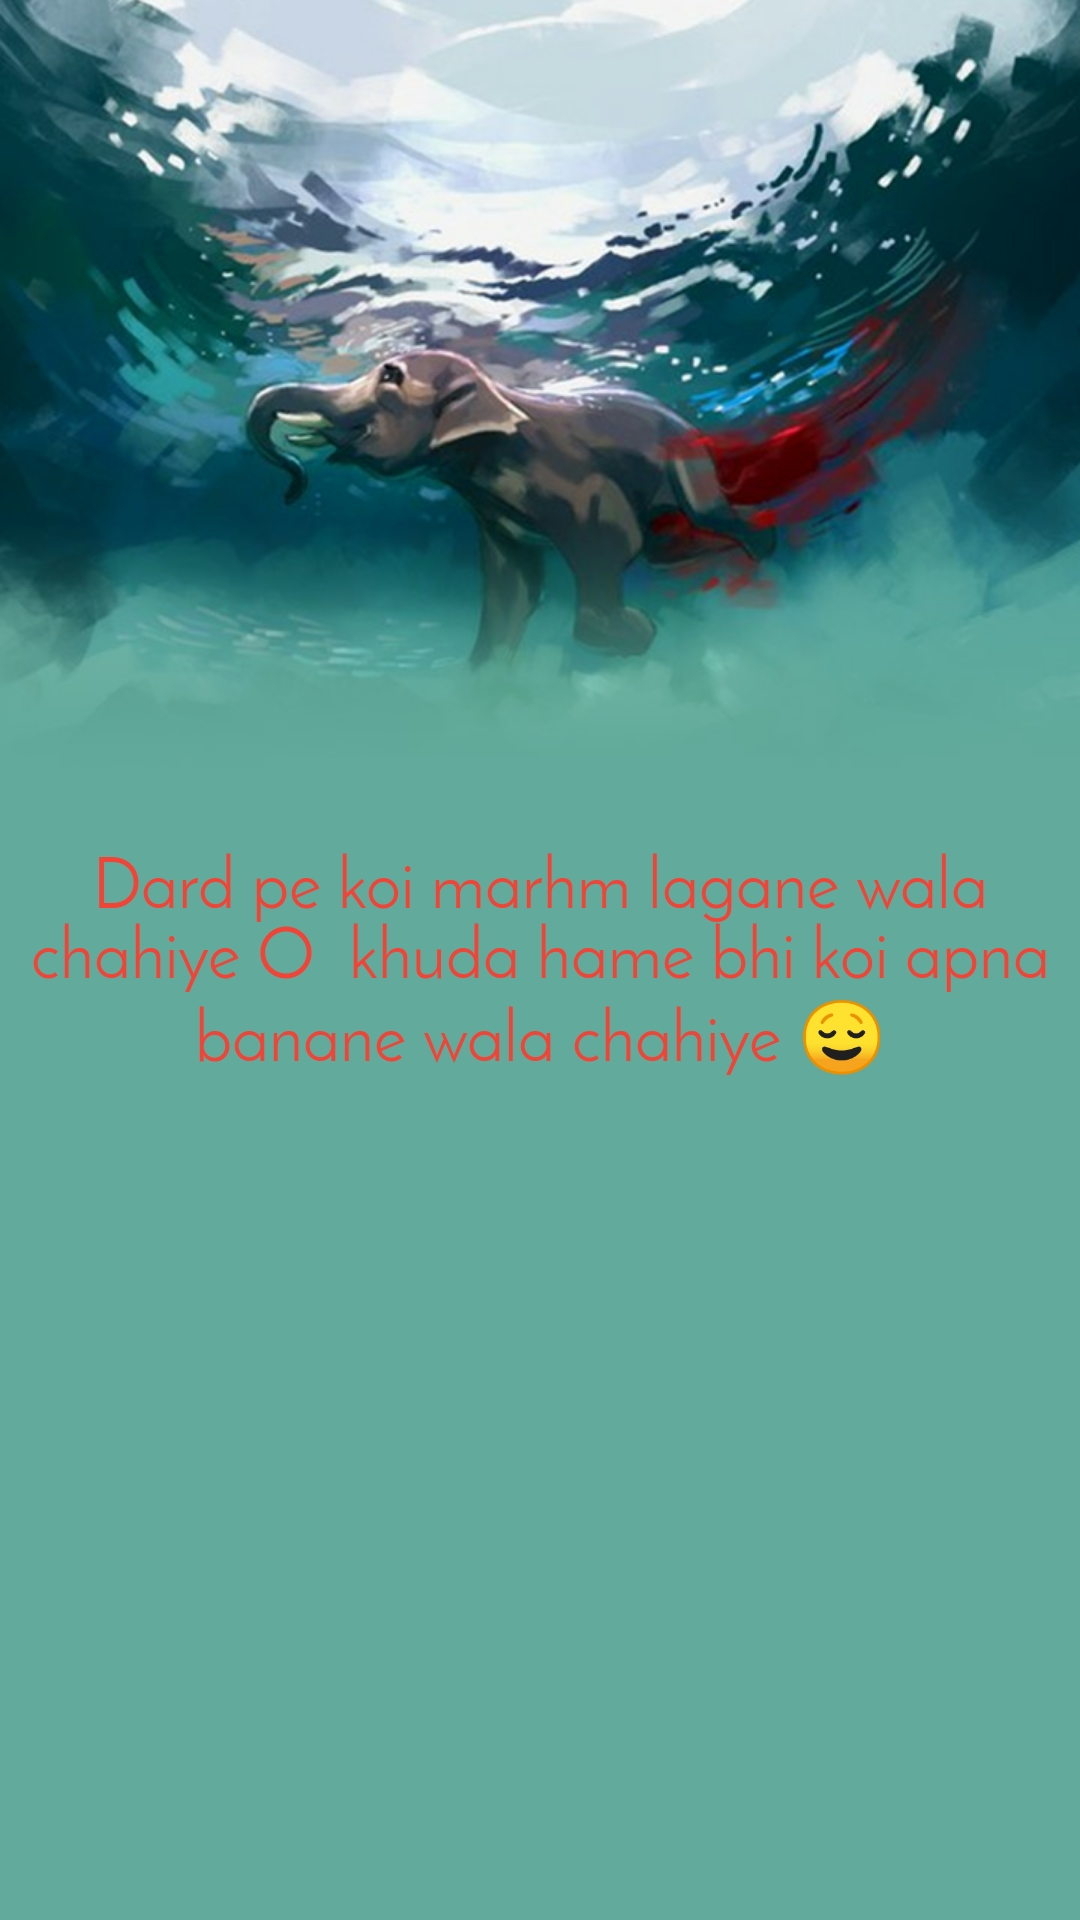 Dard pe koi marhm lagane wala chahiye O  khuda hame bhi koi apna banane wala chahiye 😌